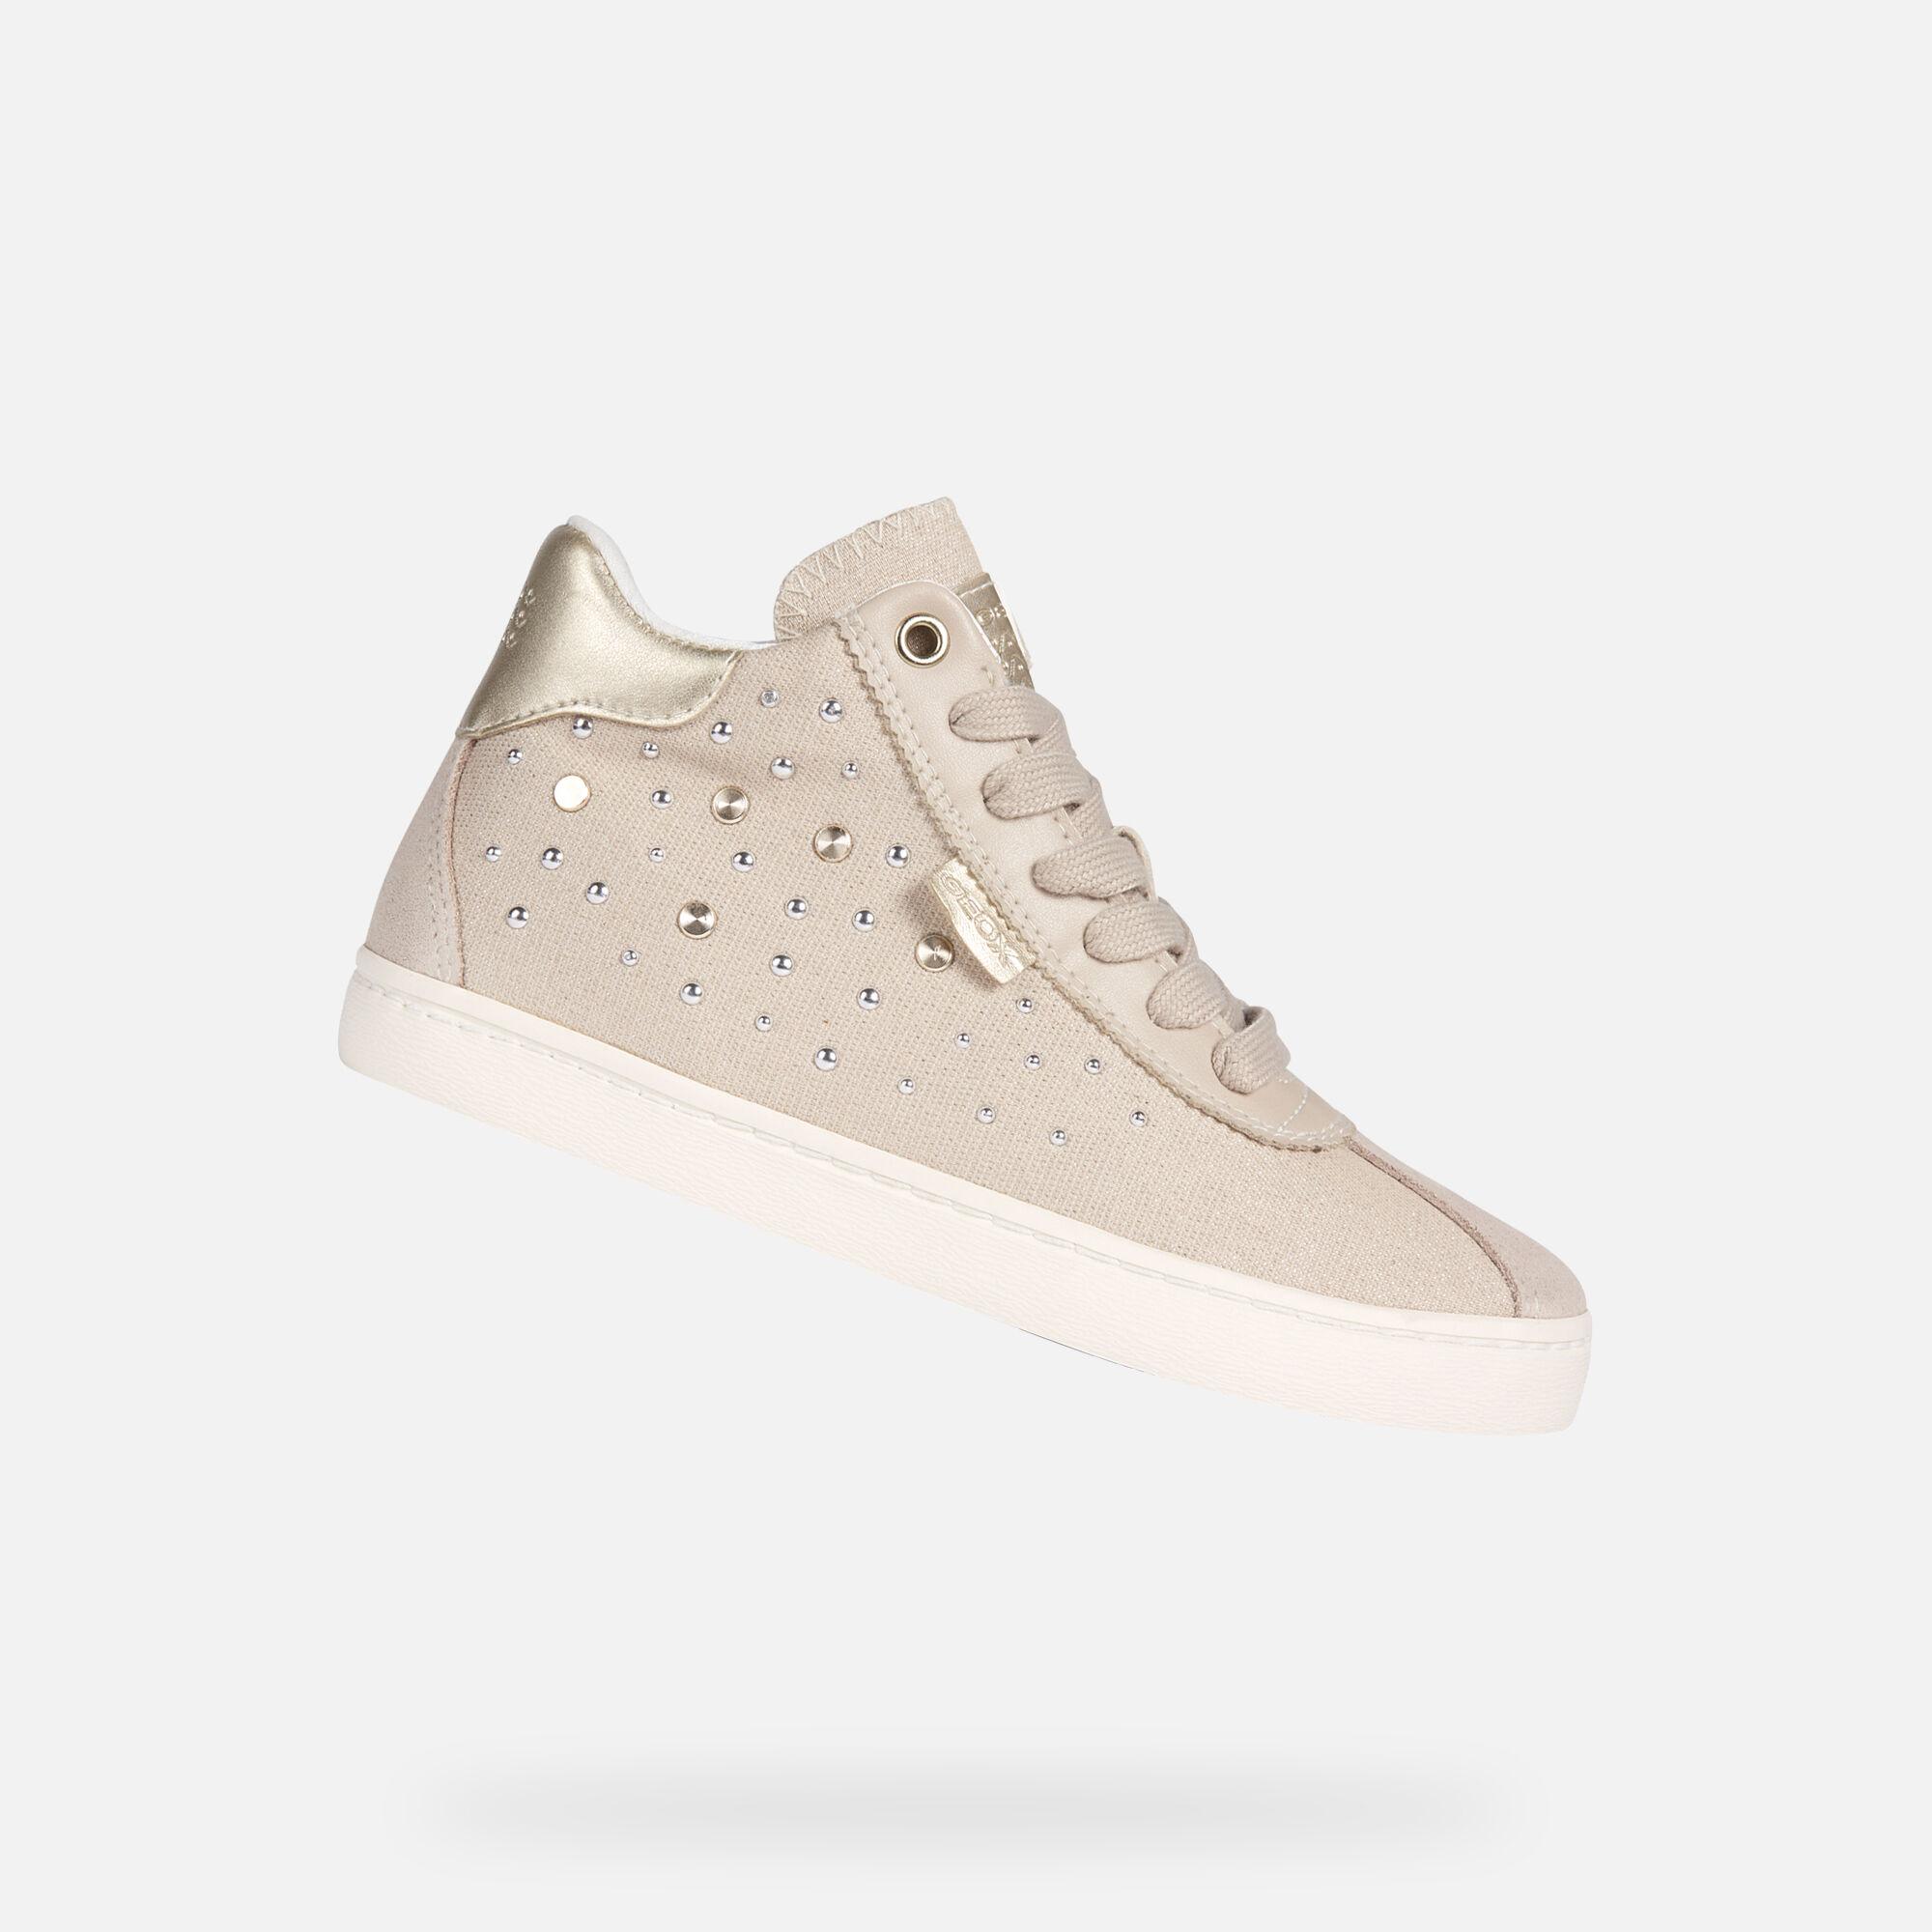 Geox J Kiwi G Girls Leather SneakersShoes